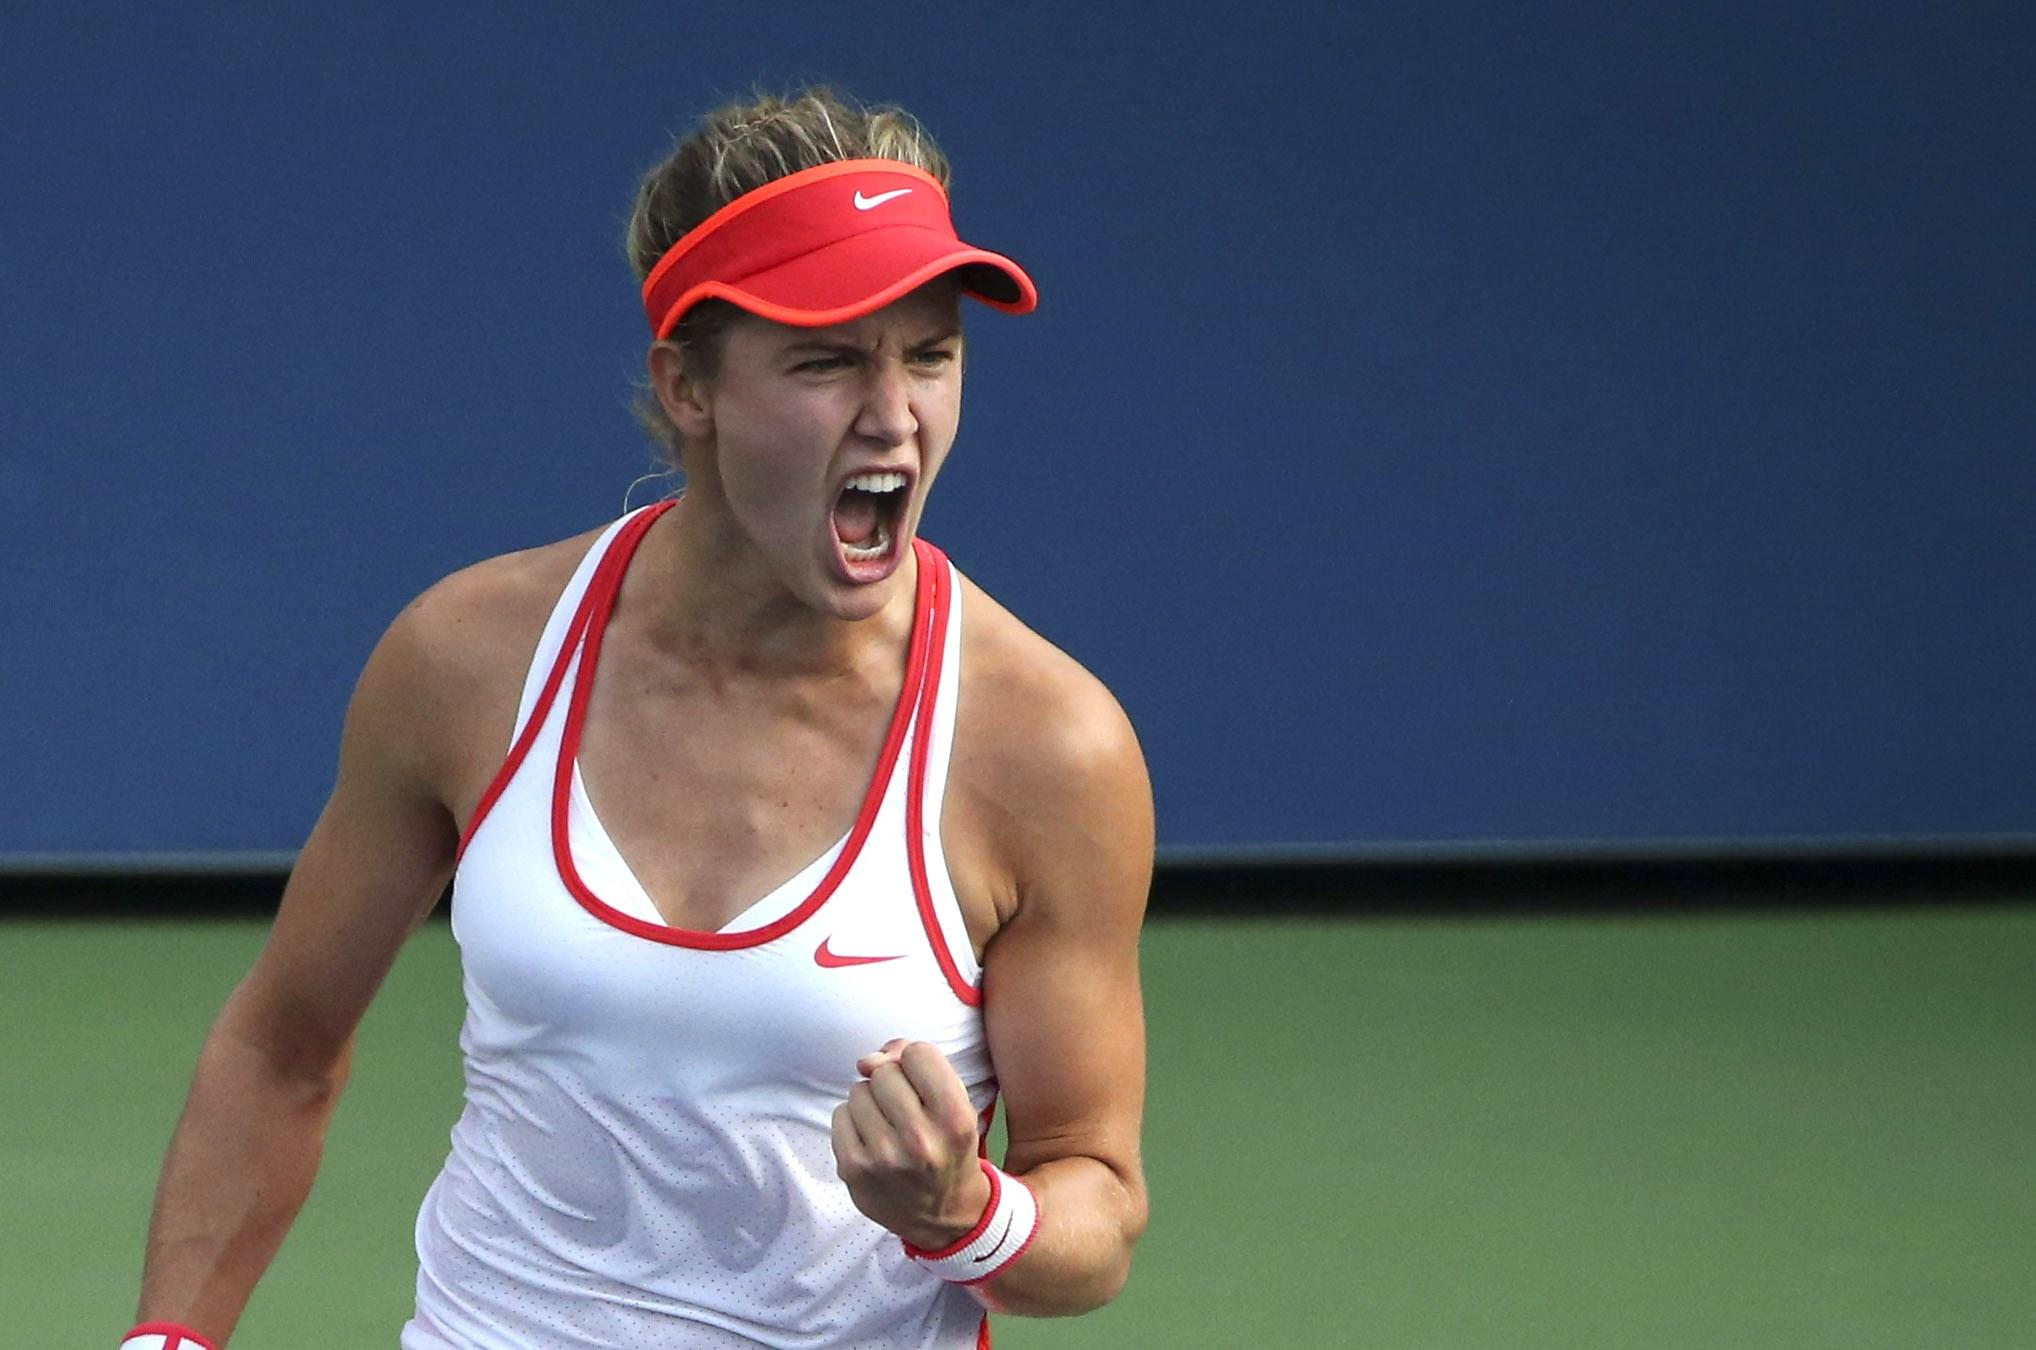 Eugenie has even beaten Serena Williams on court